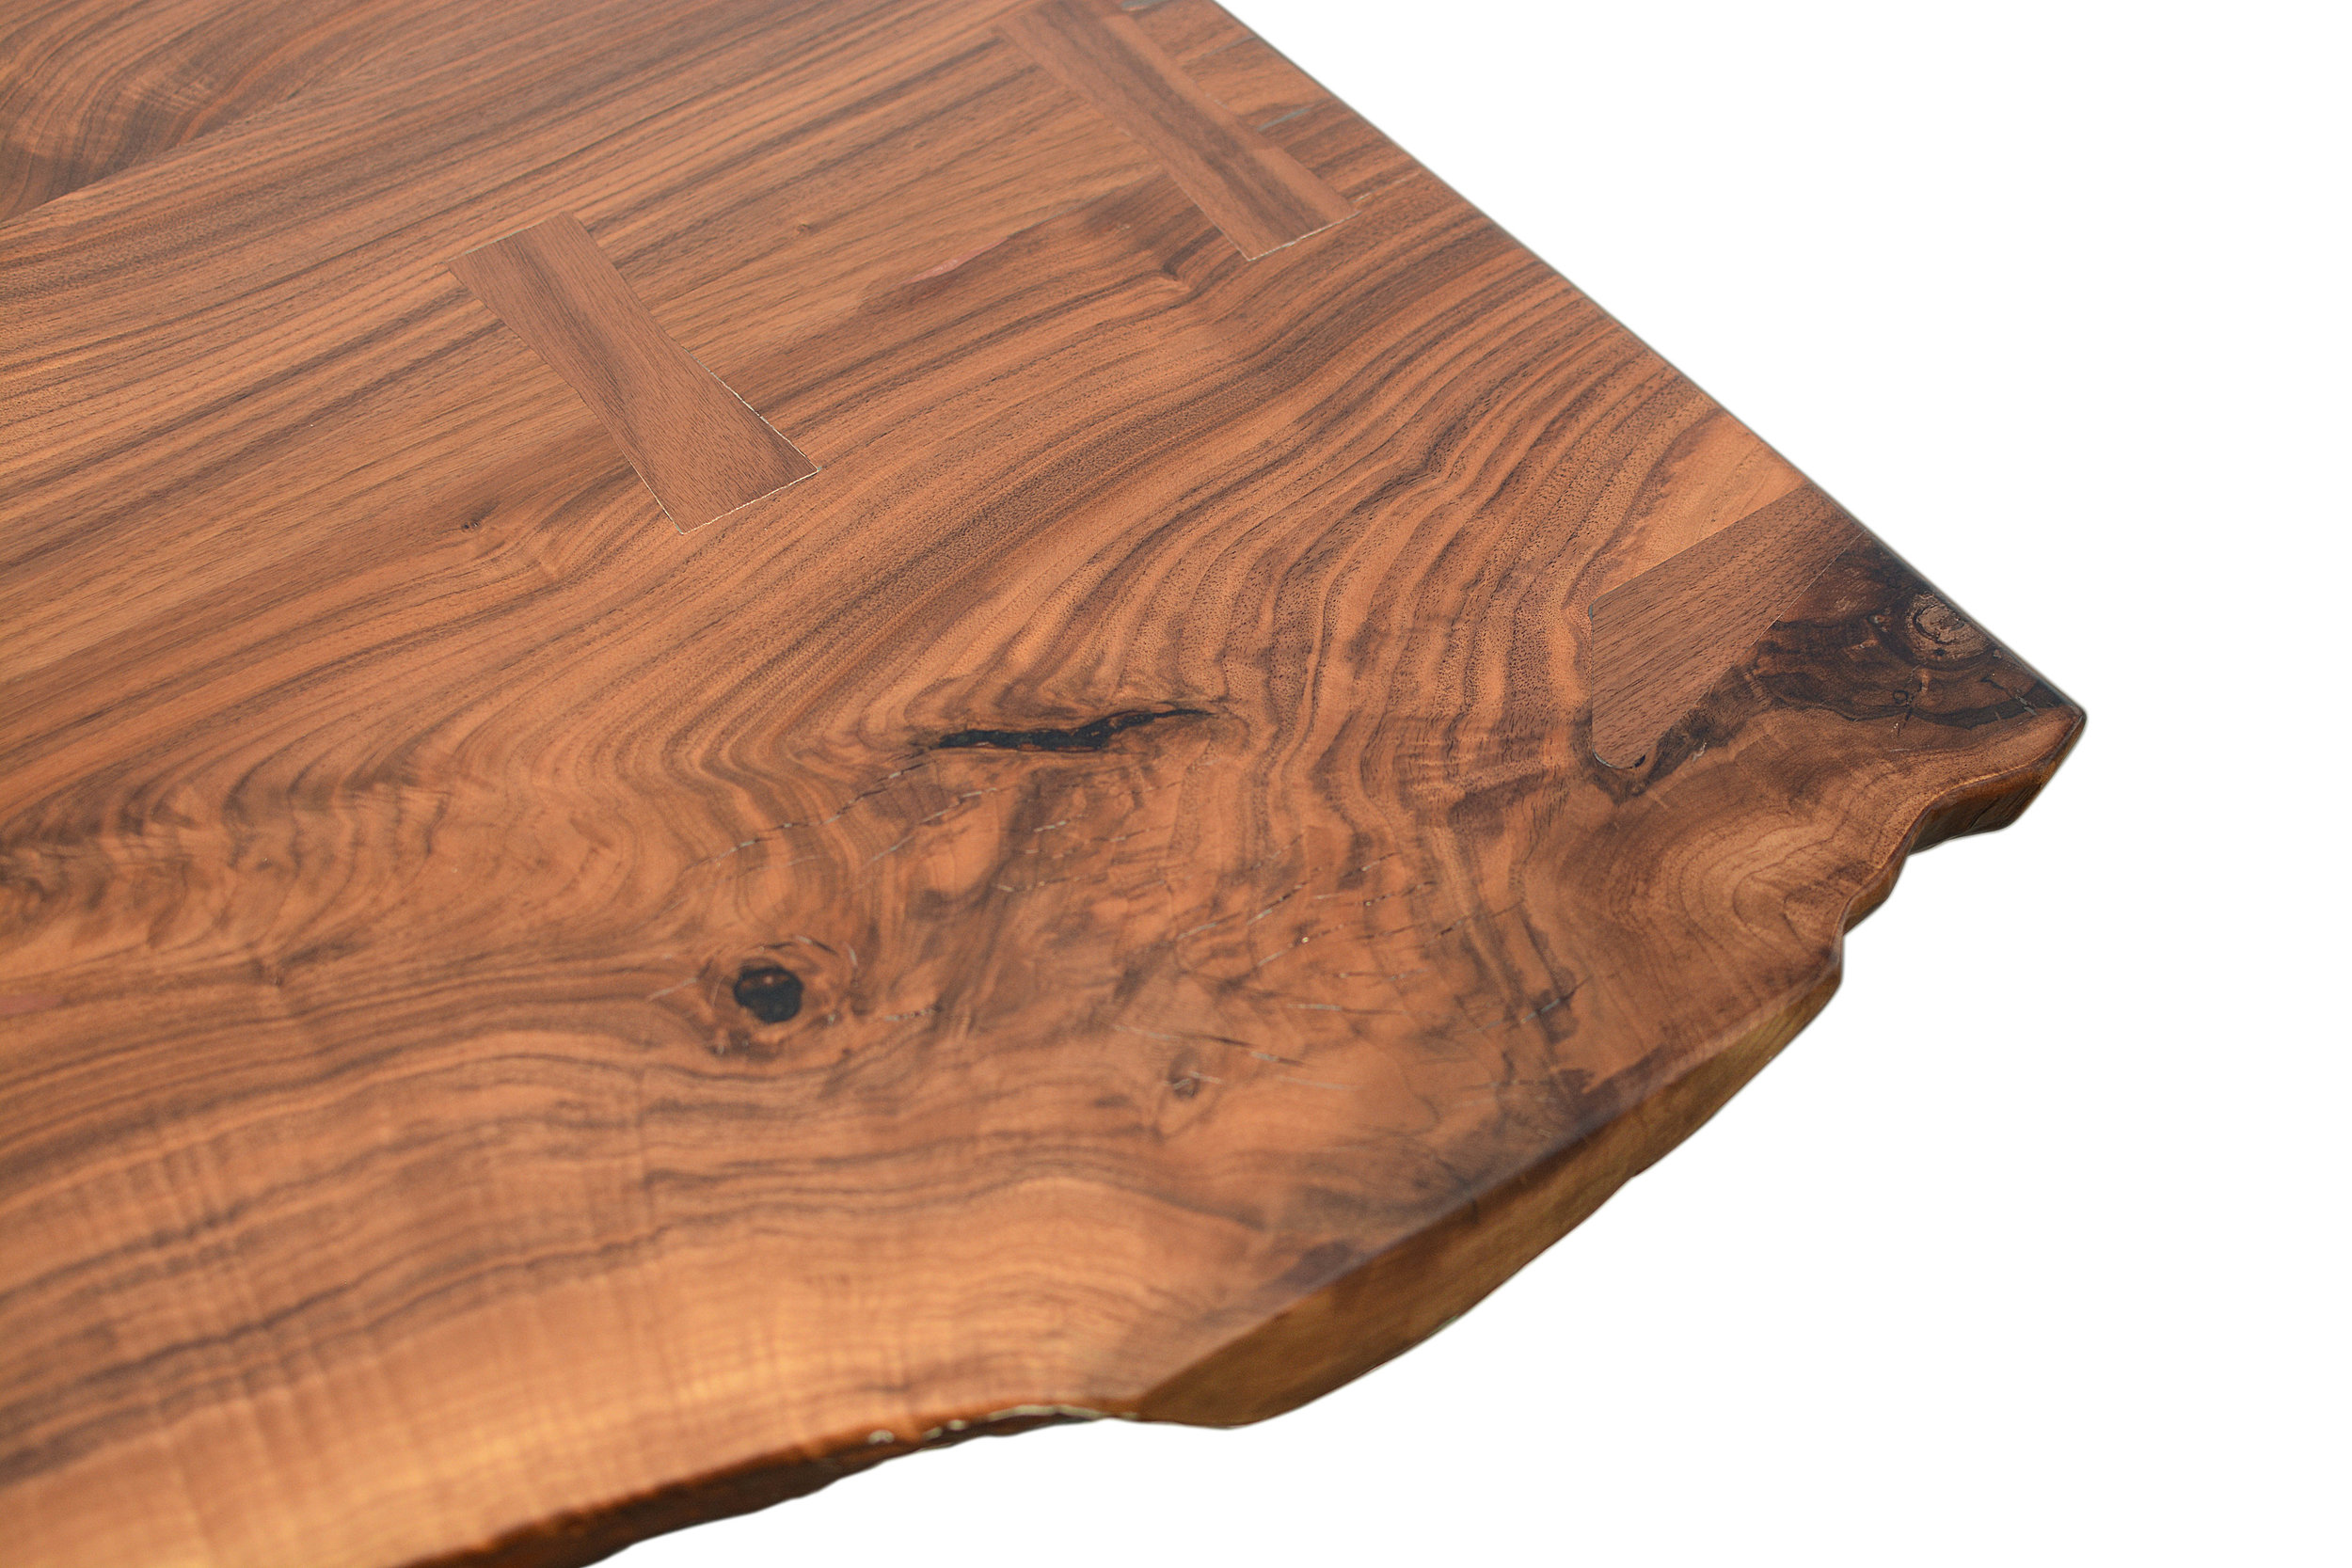 Etz & Steel Hermes Live Edge Walnut Table Close Up 20.JPG